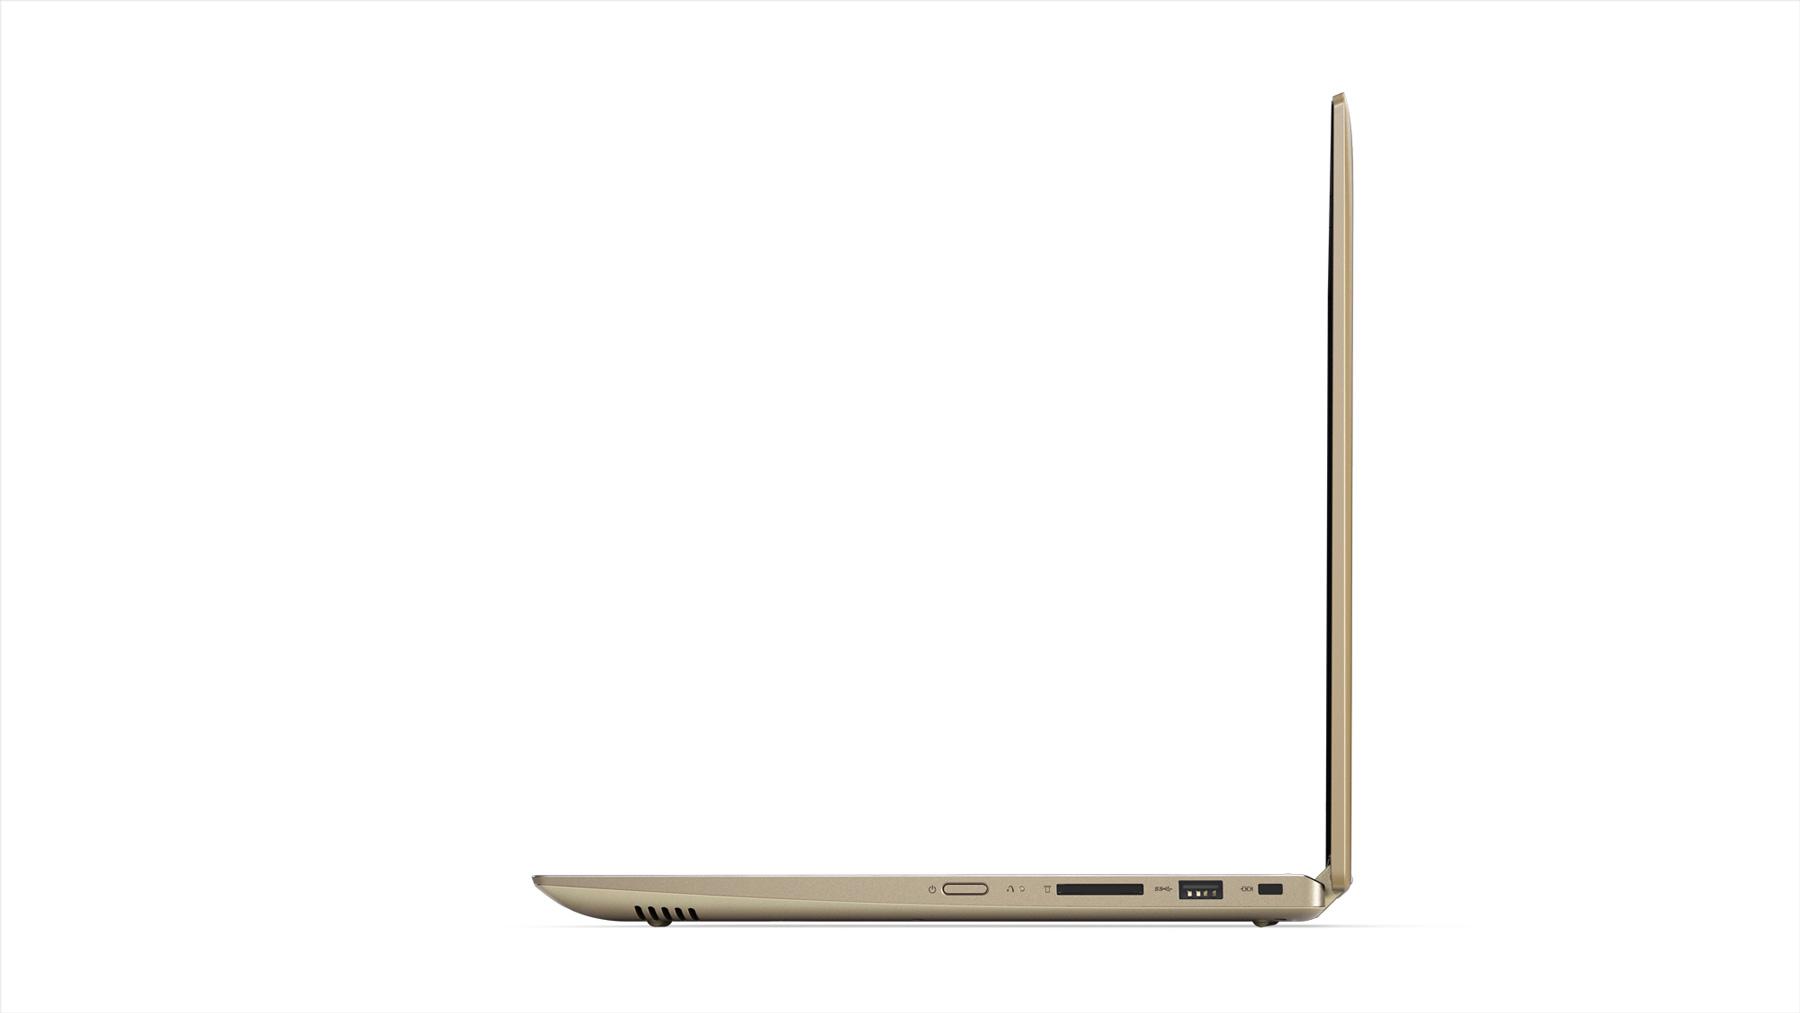 Фото  Ультрабук Lenovo Yoga 520 Gold Metallic (81C800DBRA)